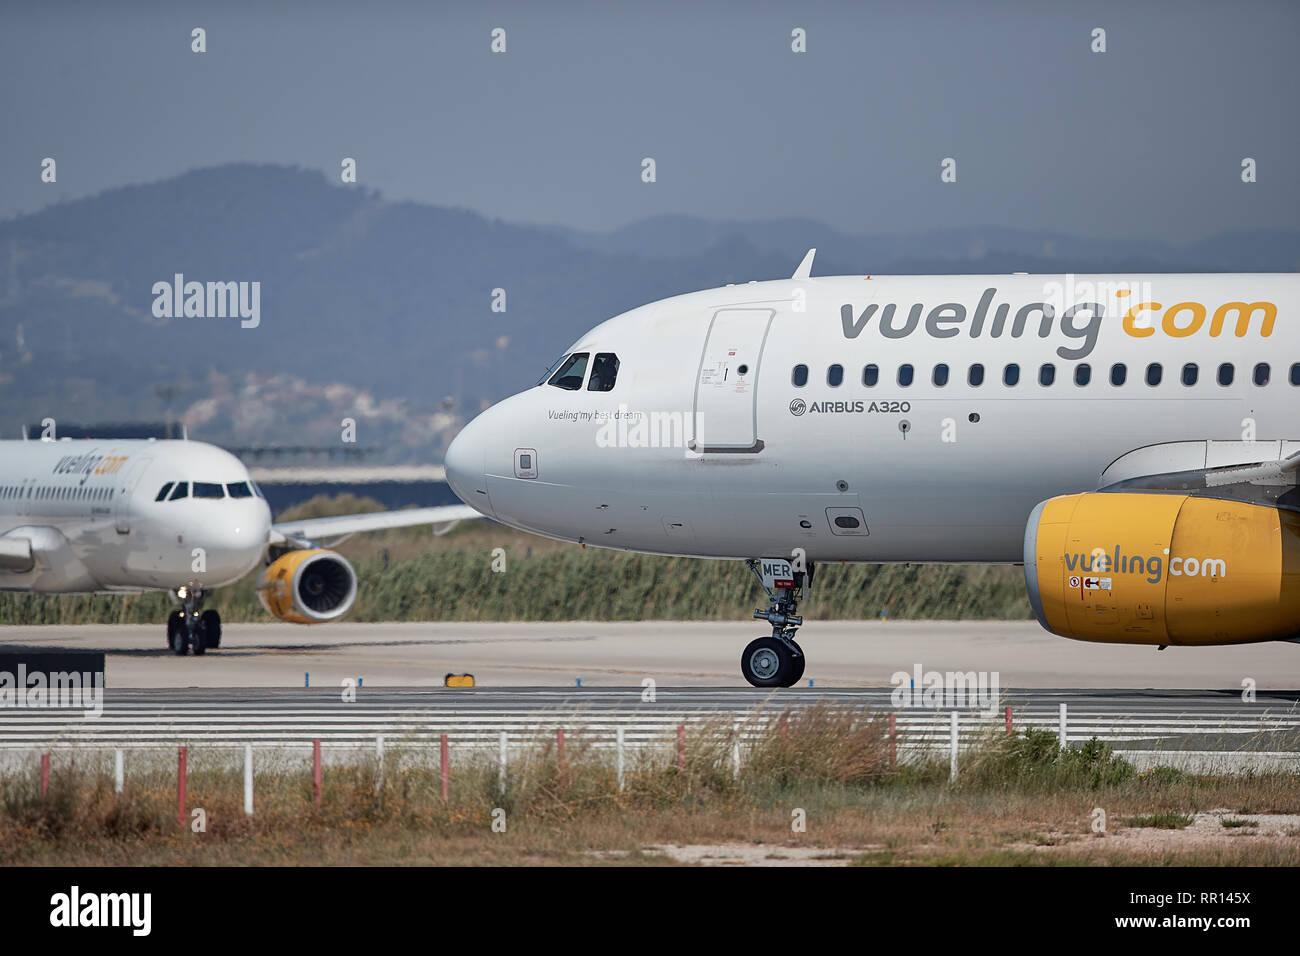 Multiple Vueling airbus passenger jets in Barcelona - Stock Image